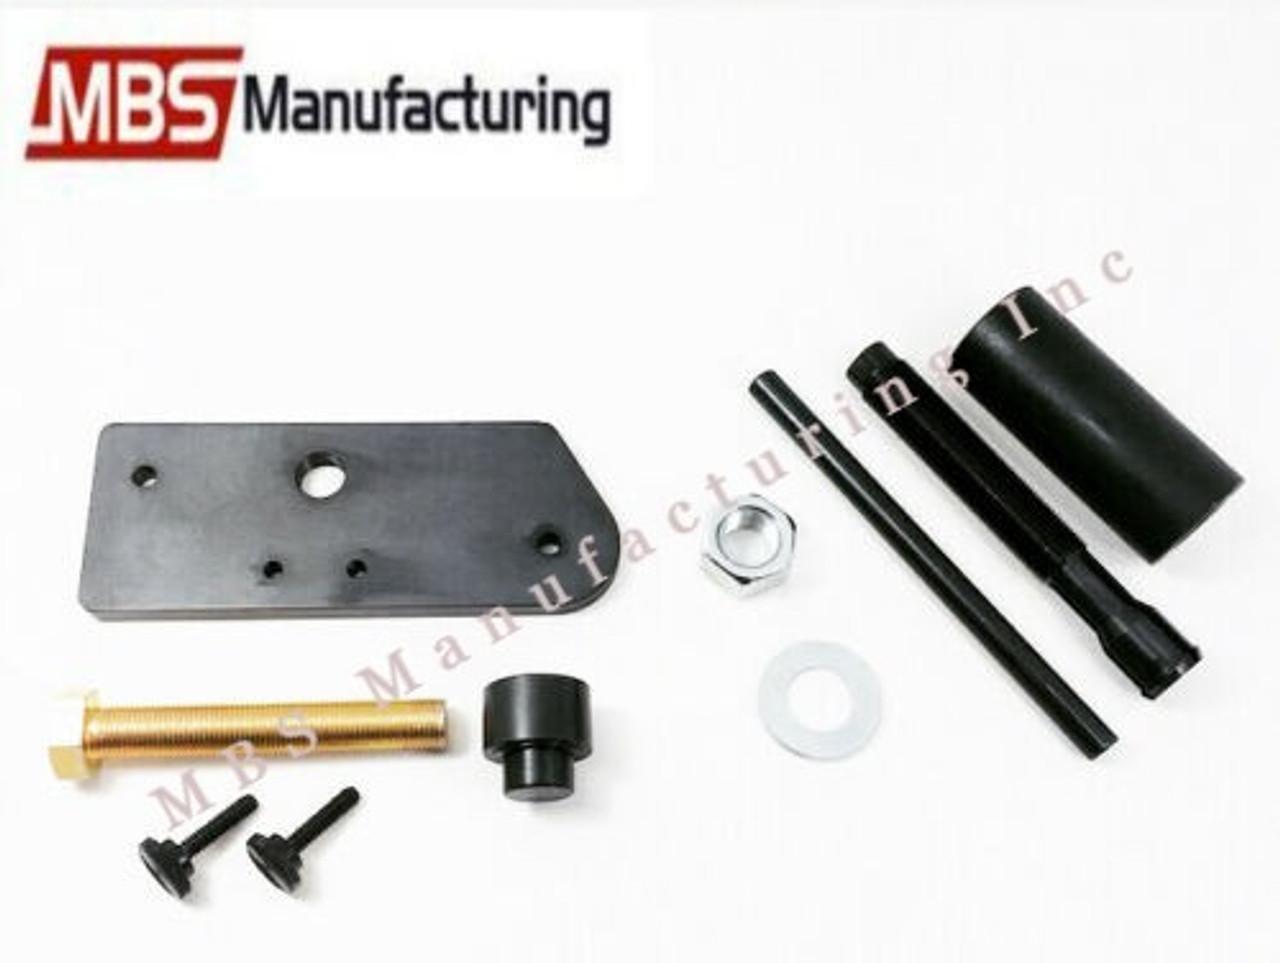 Harley Davidson Inner Single Cam Bearing Puller and Installer Set EVO Evolution and (1) KOYO Bearing